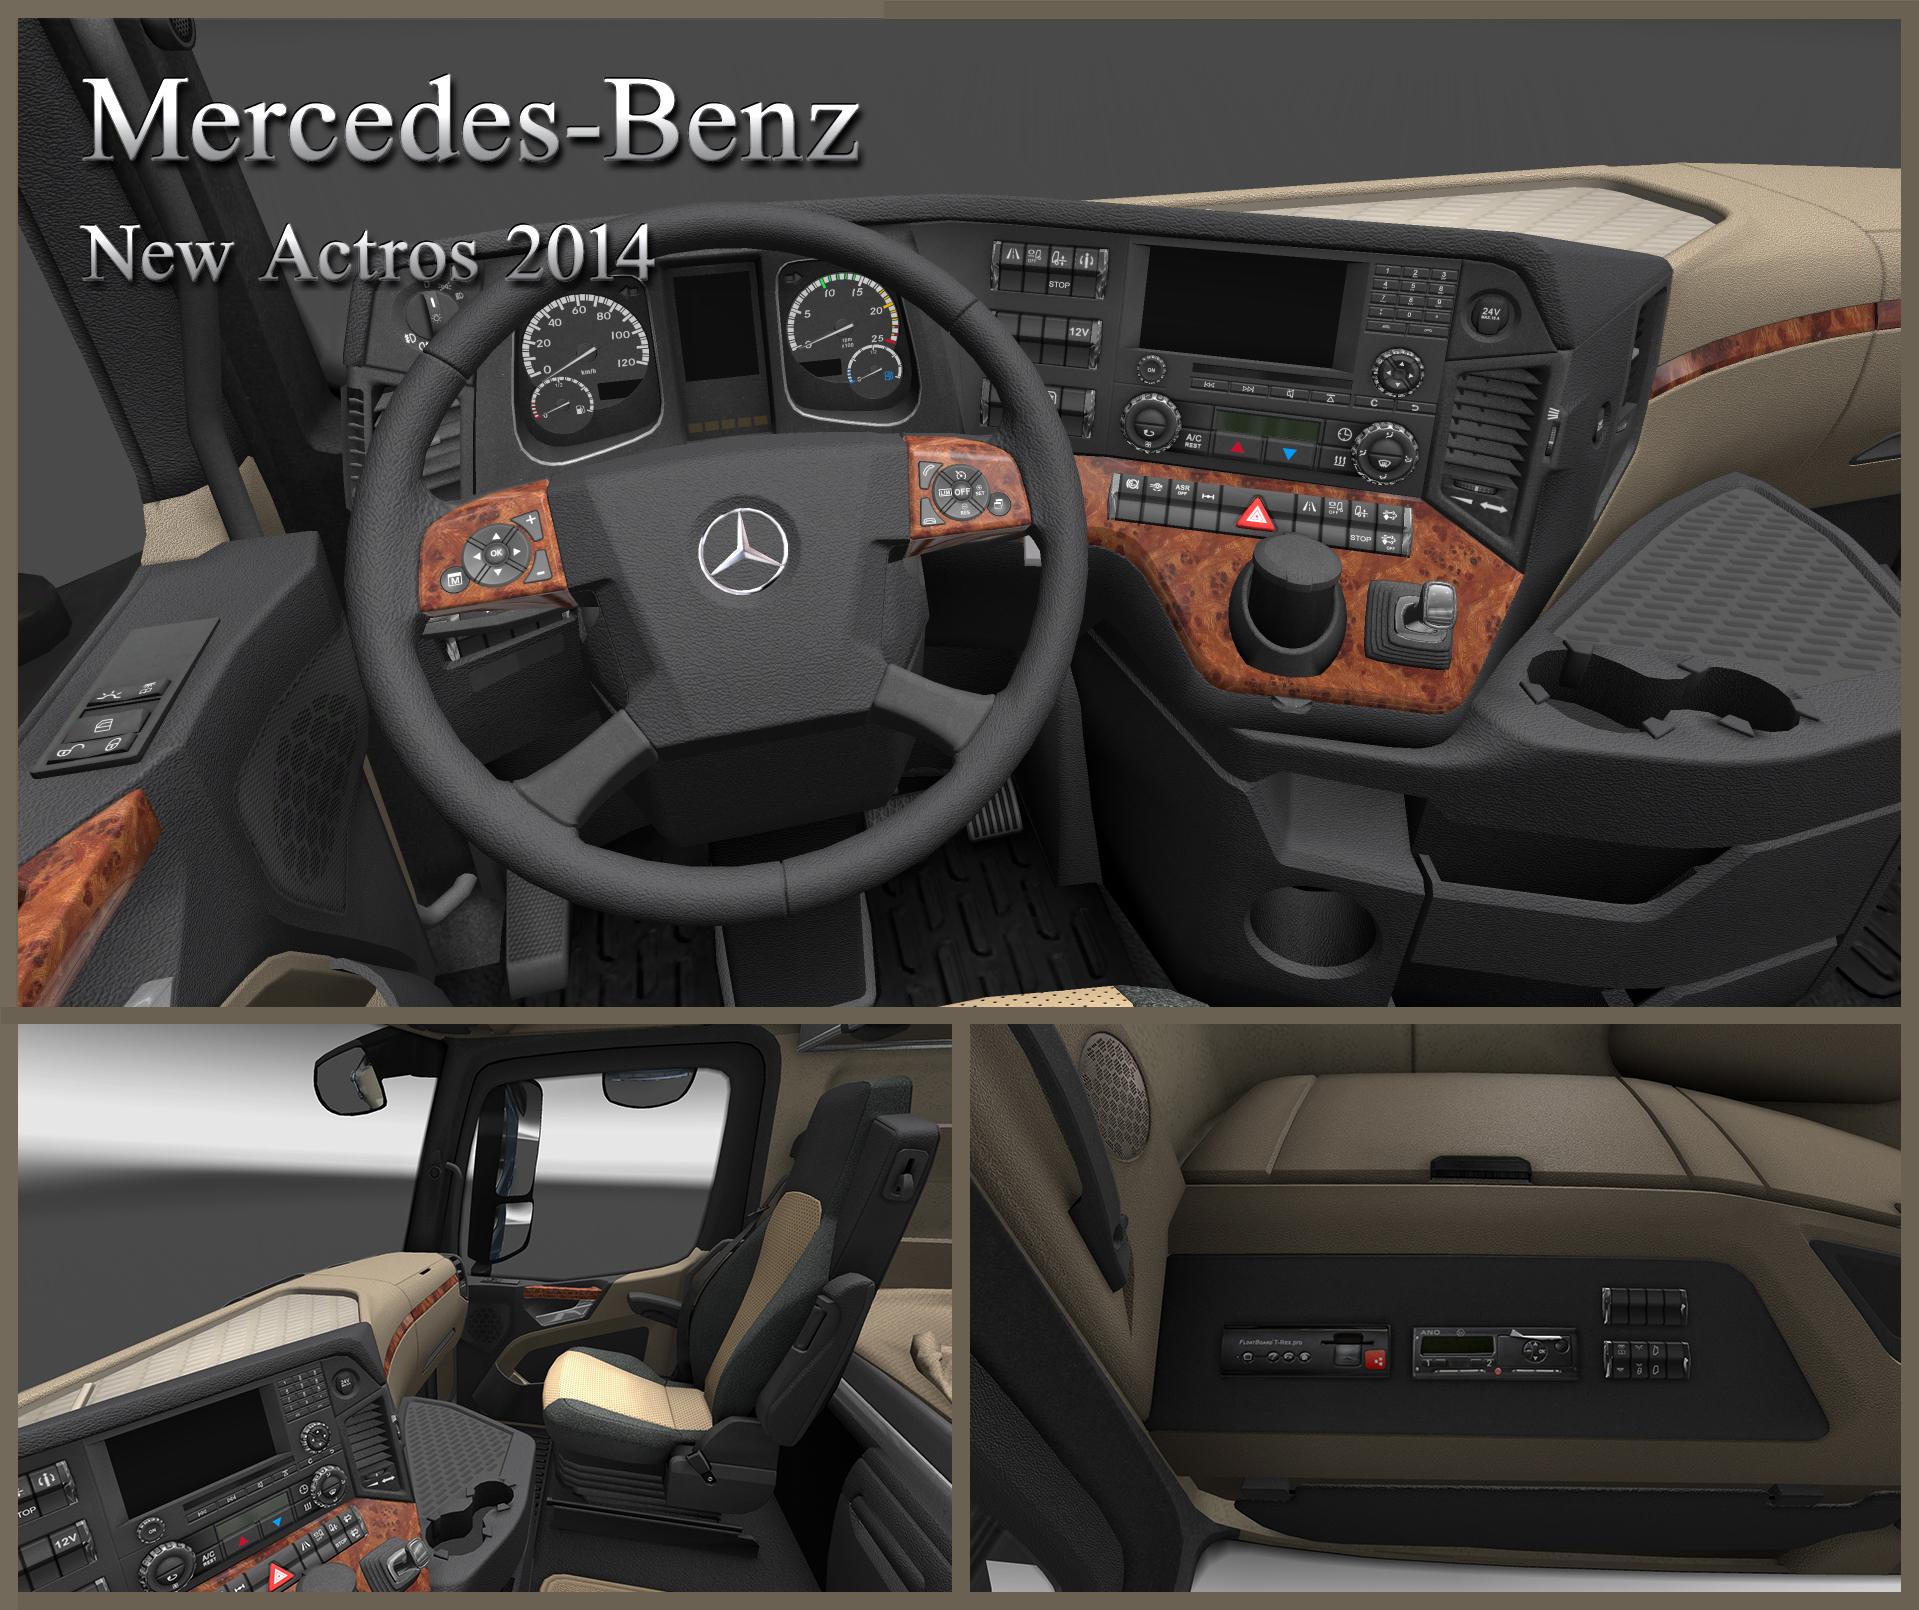 MB-New-Actros-2014-Interior2.jpg